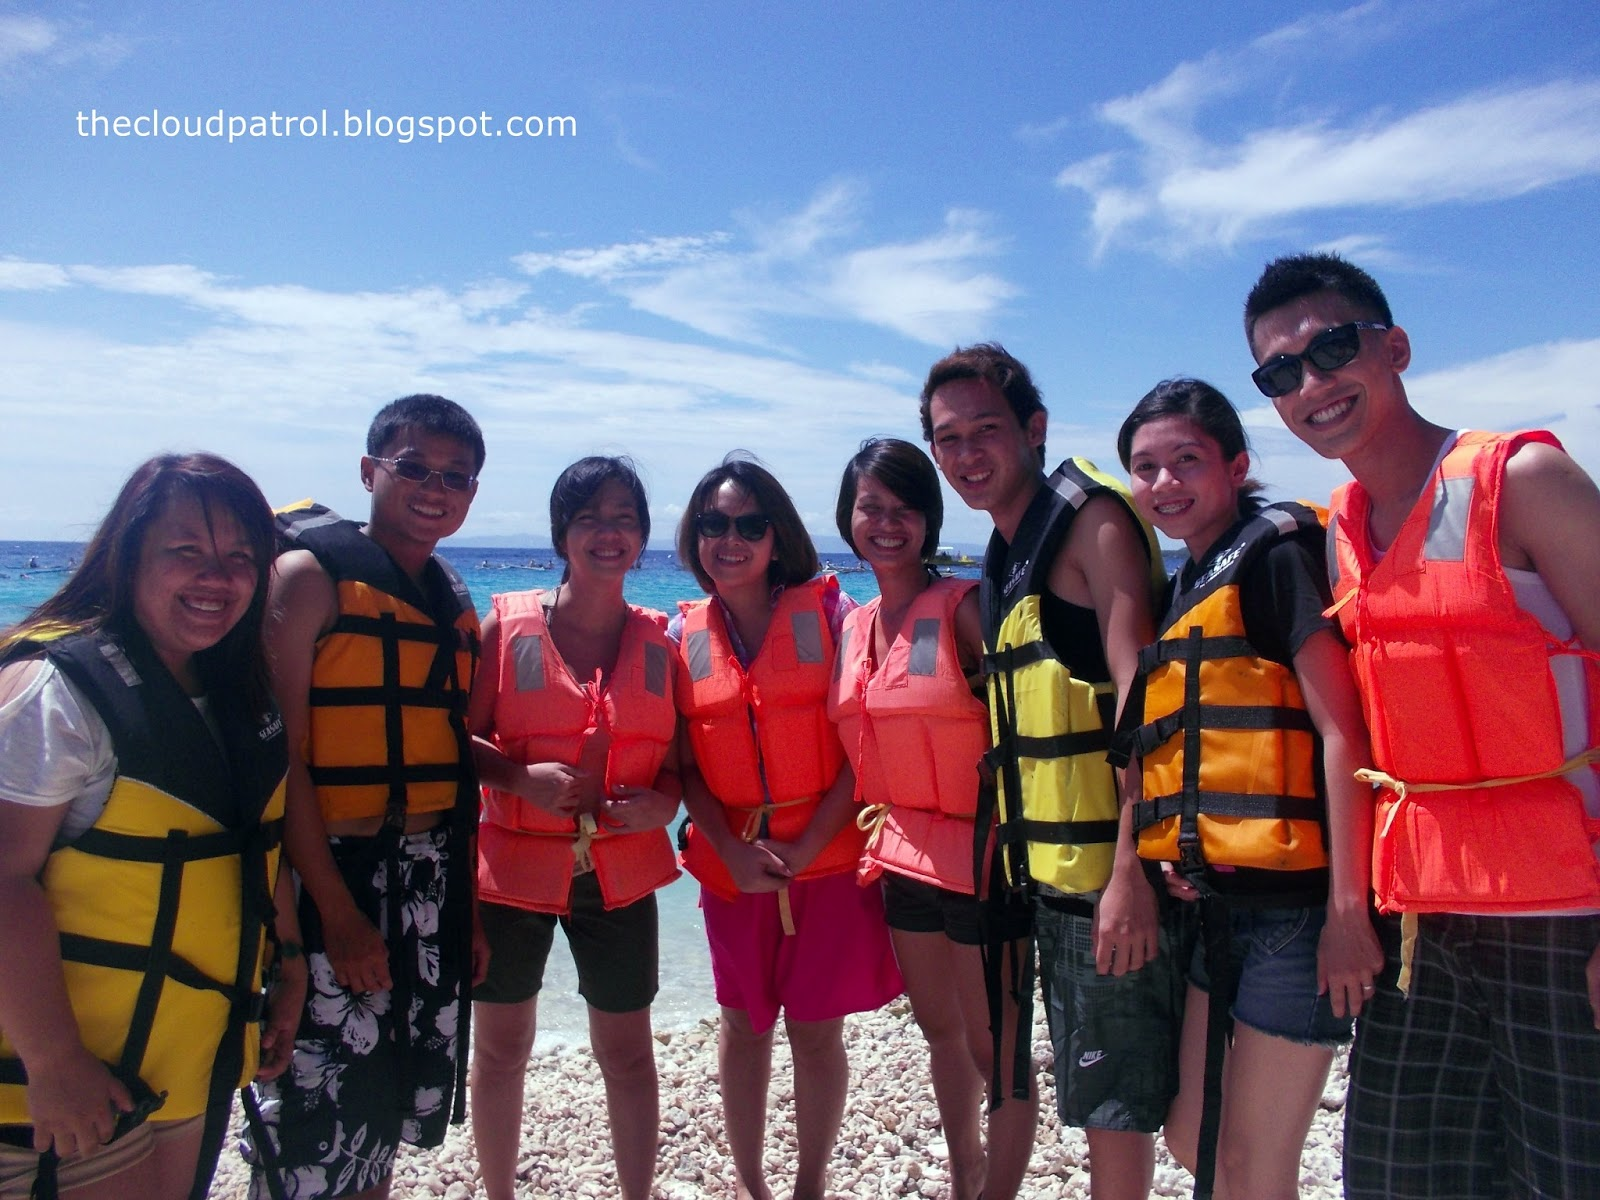 Butanding, whale shark, cebu, oslob, philippines, Beach, vacation,